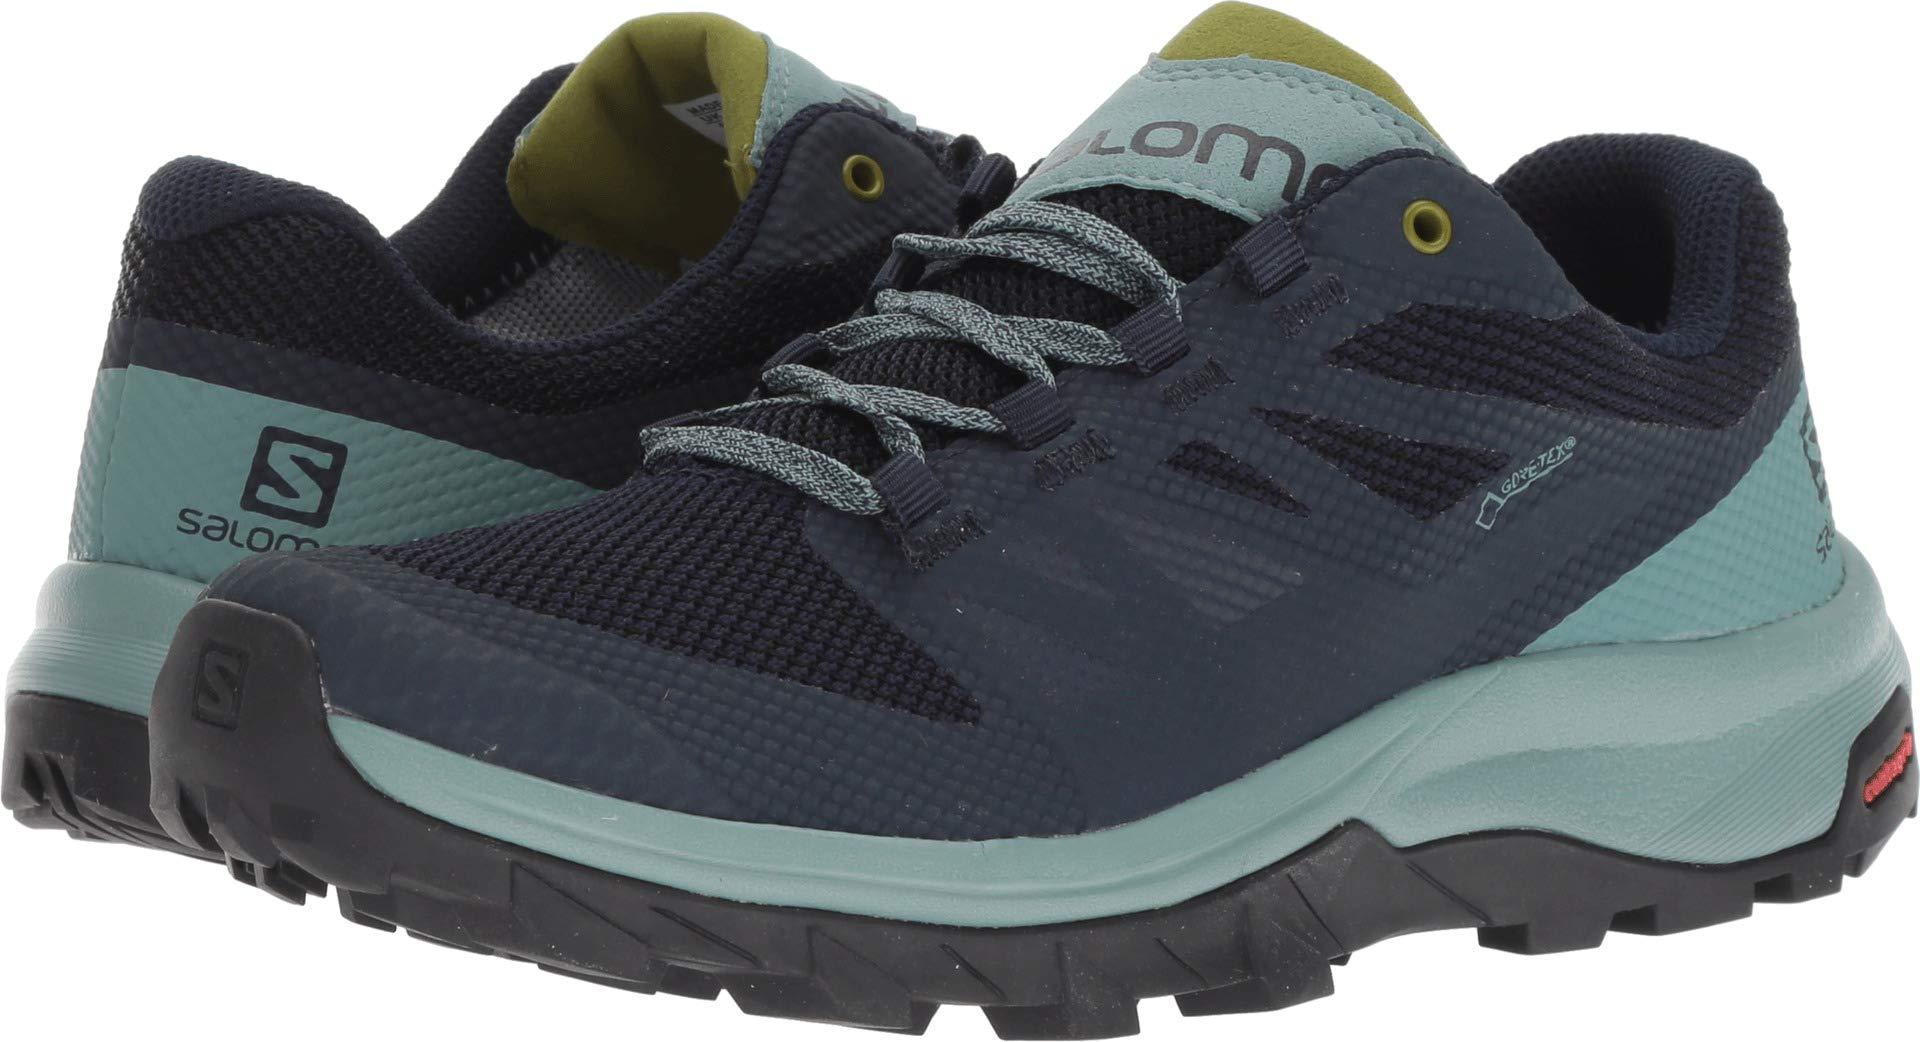 Salomon Outline GTX W Womens Hiking Boot, Trellis/Navy Blazer/Guacamole, 10